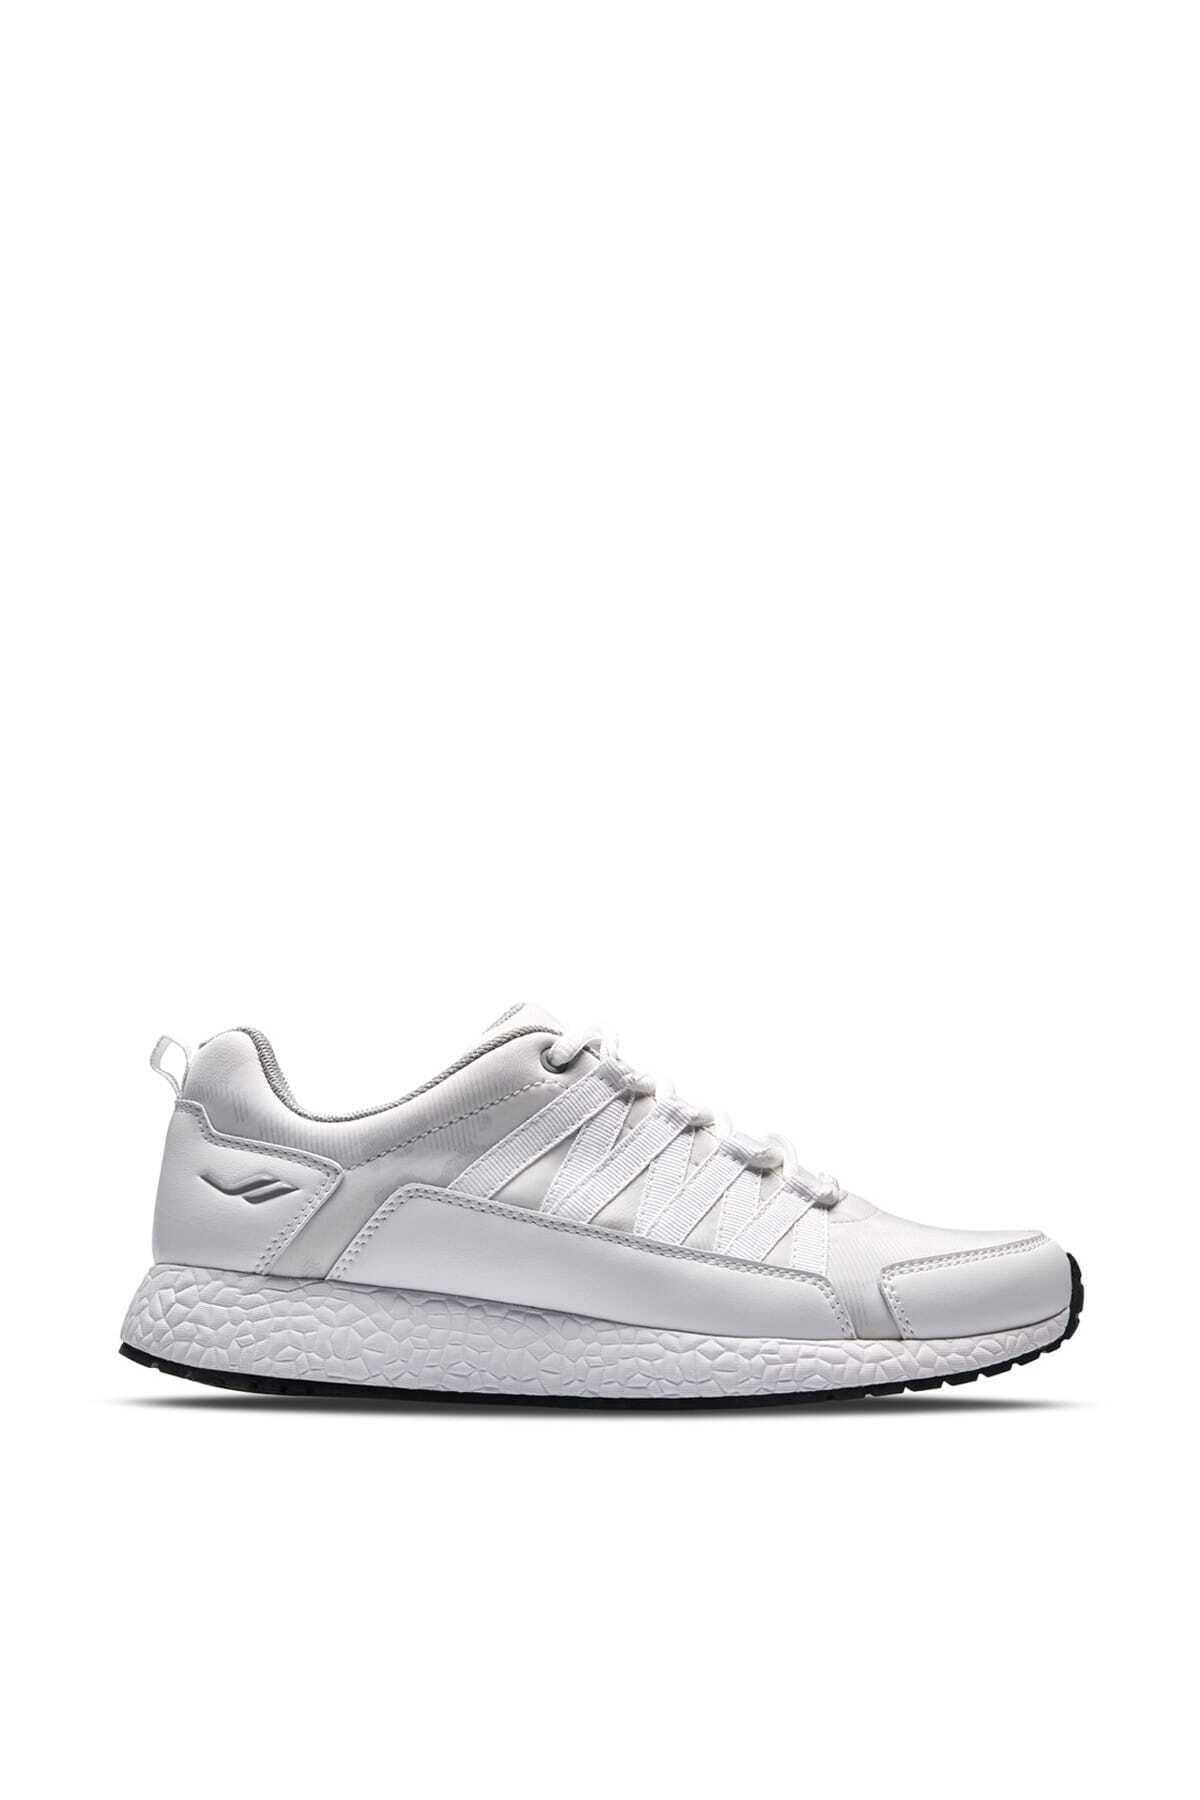 Lescon Kadın Sneaker - L-6609 Easystep - 19BAU006609G-001 1